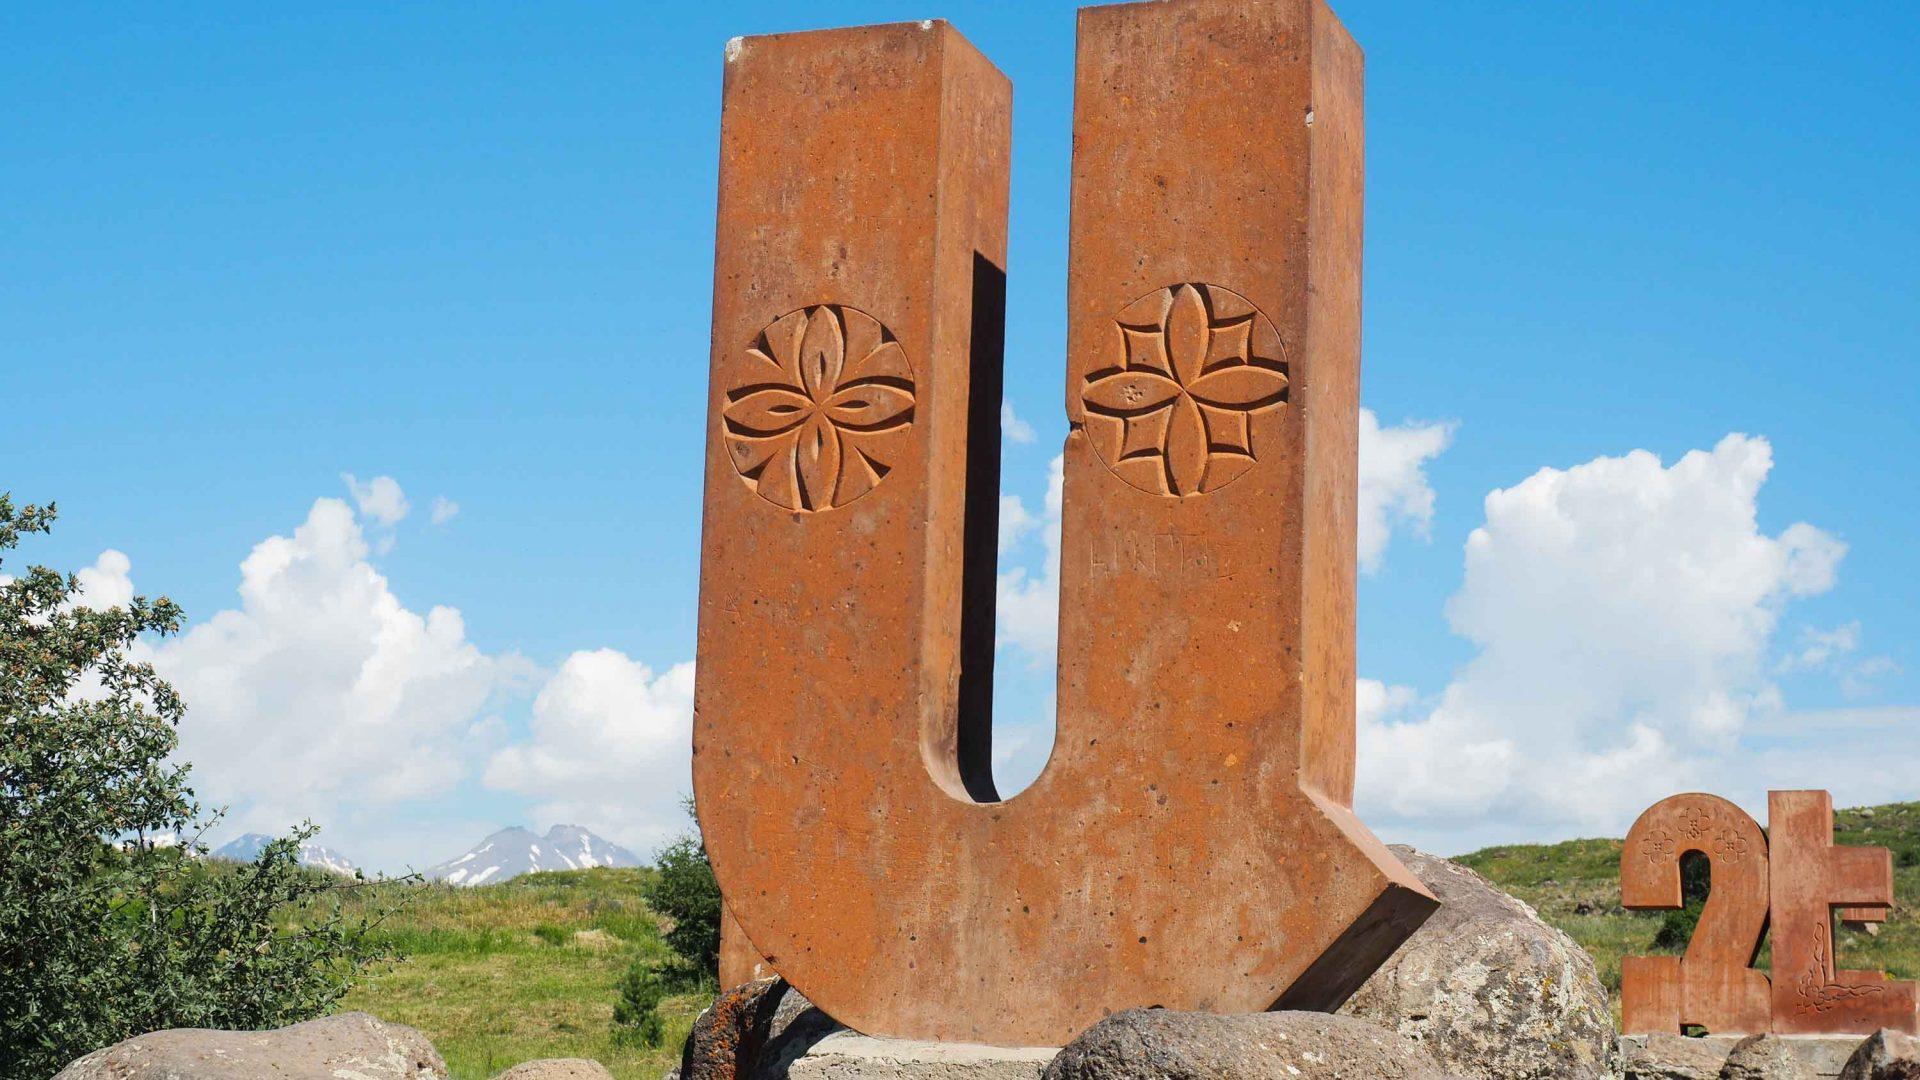 Letters of the Armenian alphabet dot the landscape.